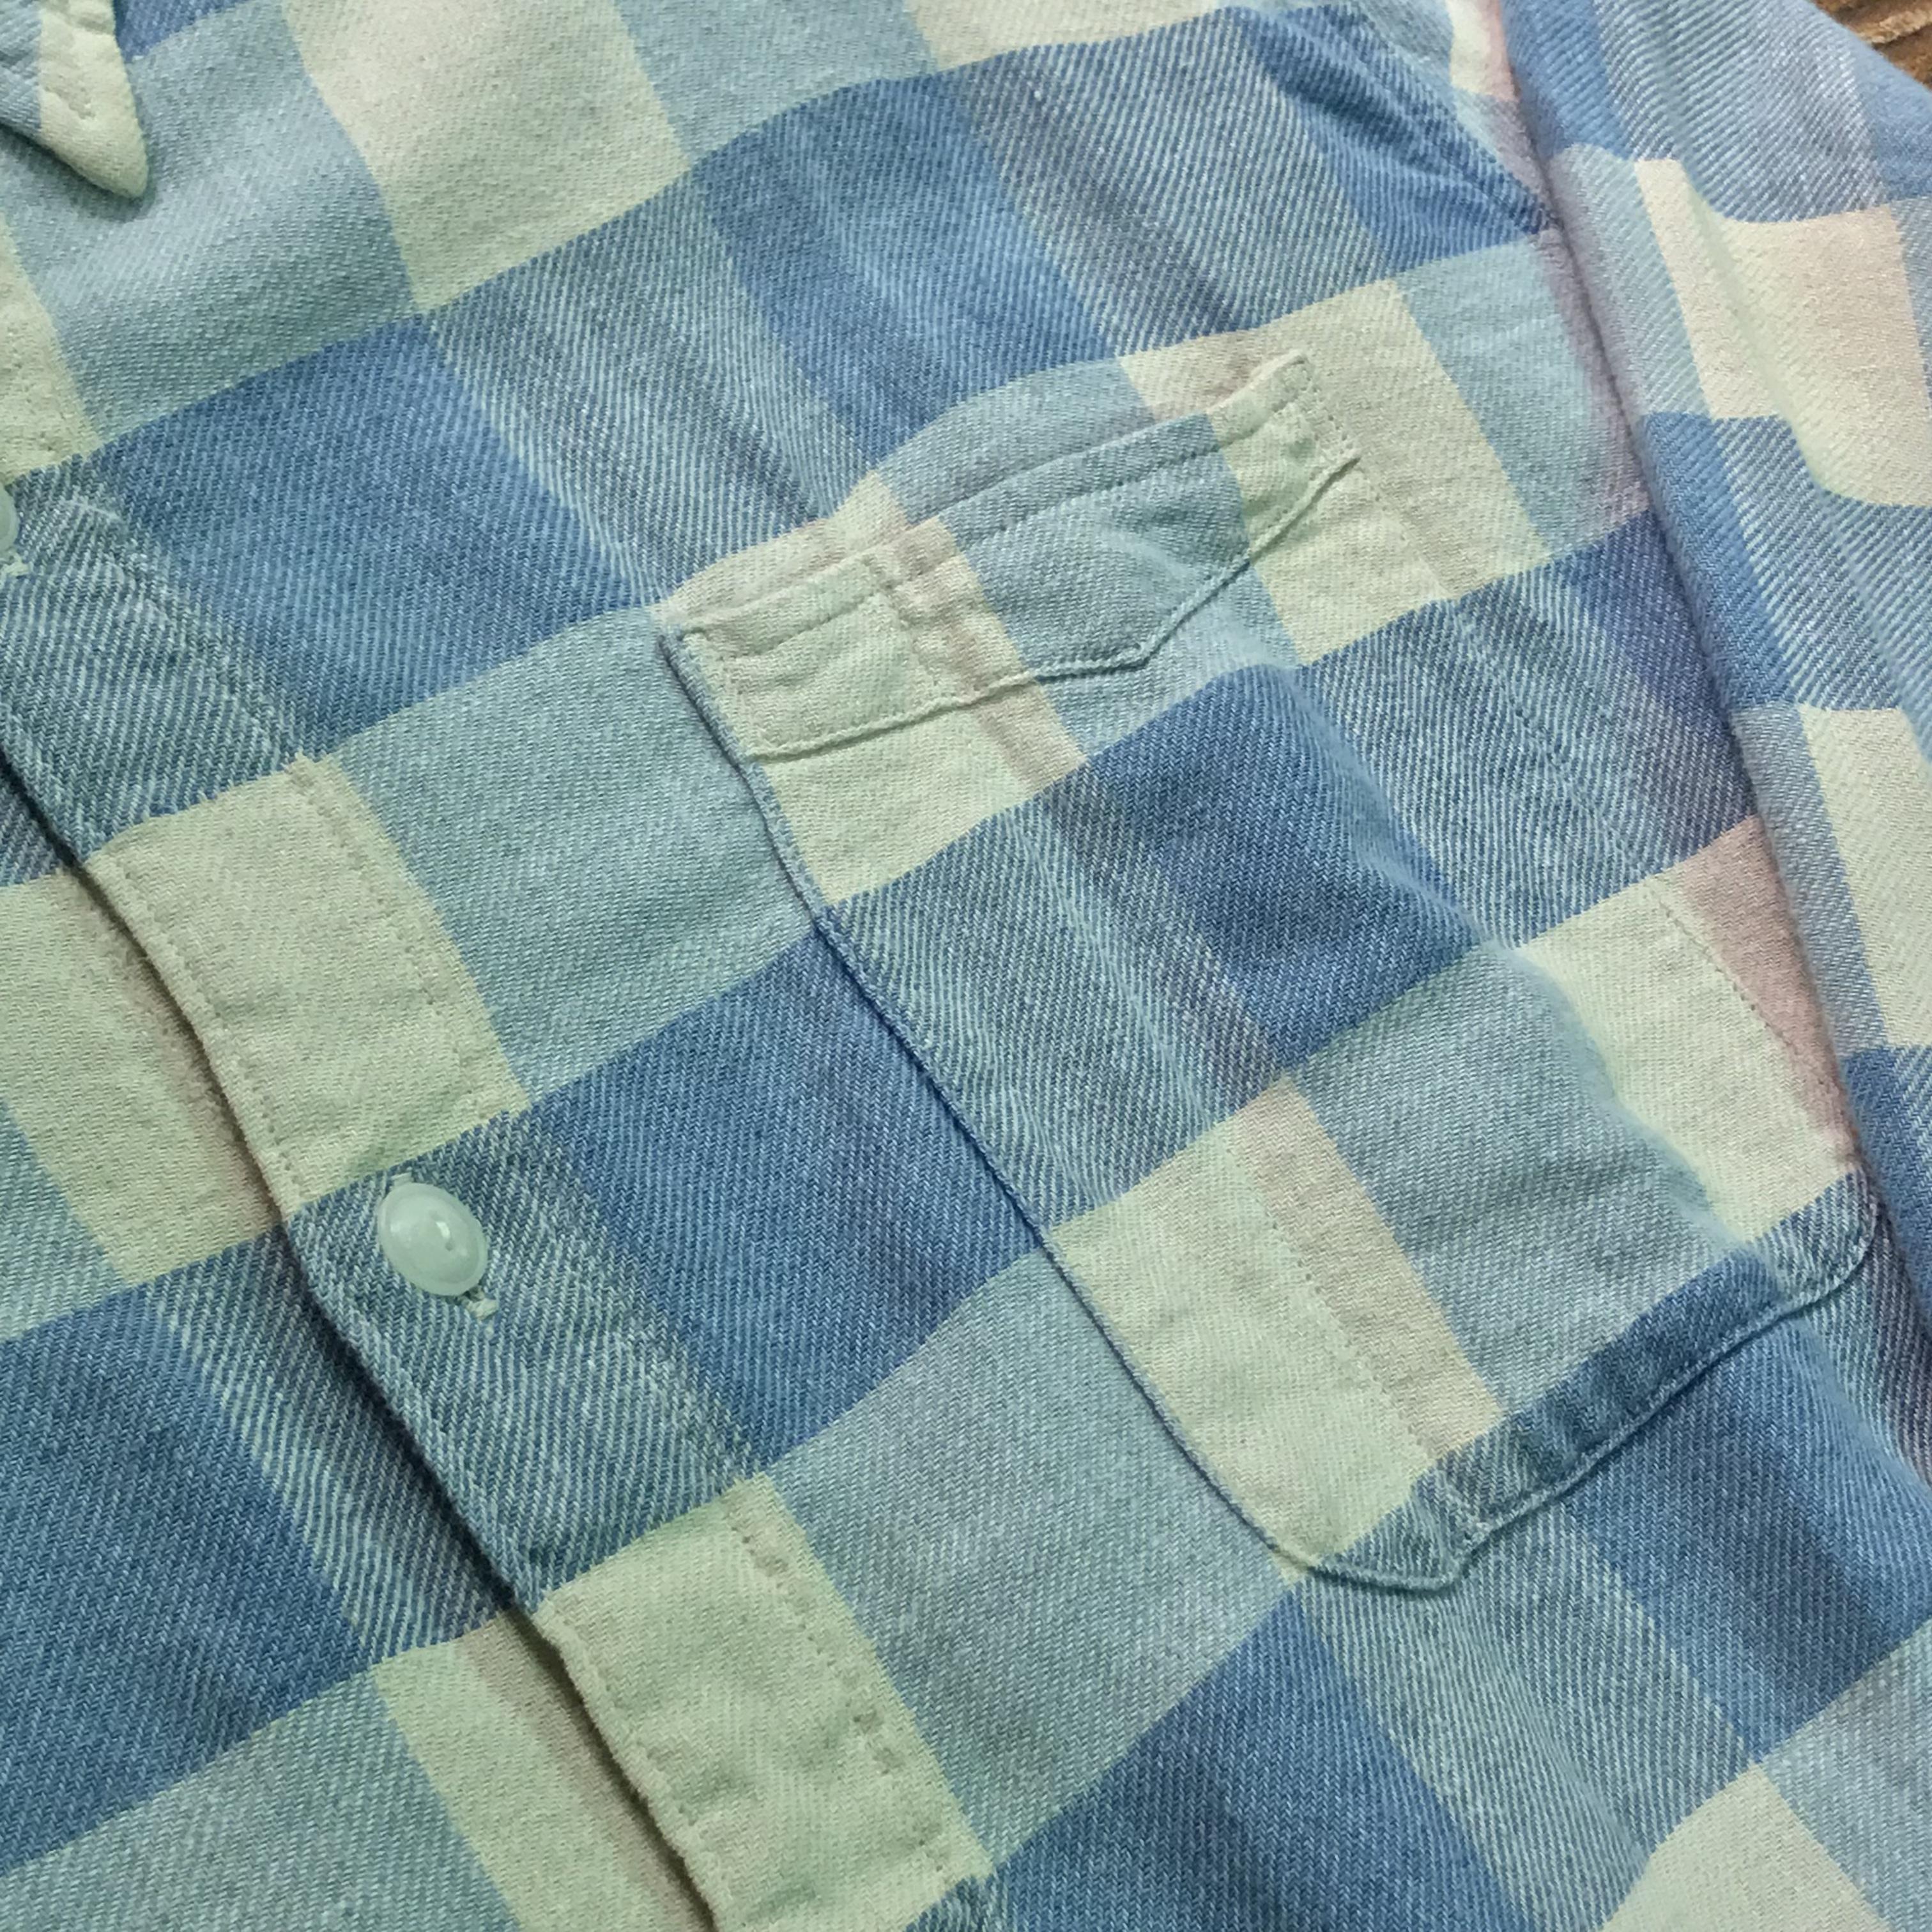 RRL Check Nel Shirts【新品】ダブルアールエル ブロックチェック シャツ